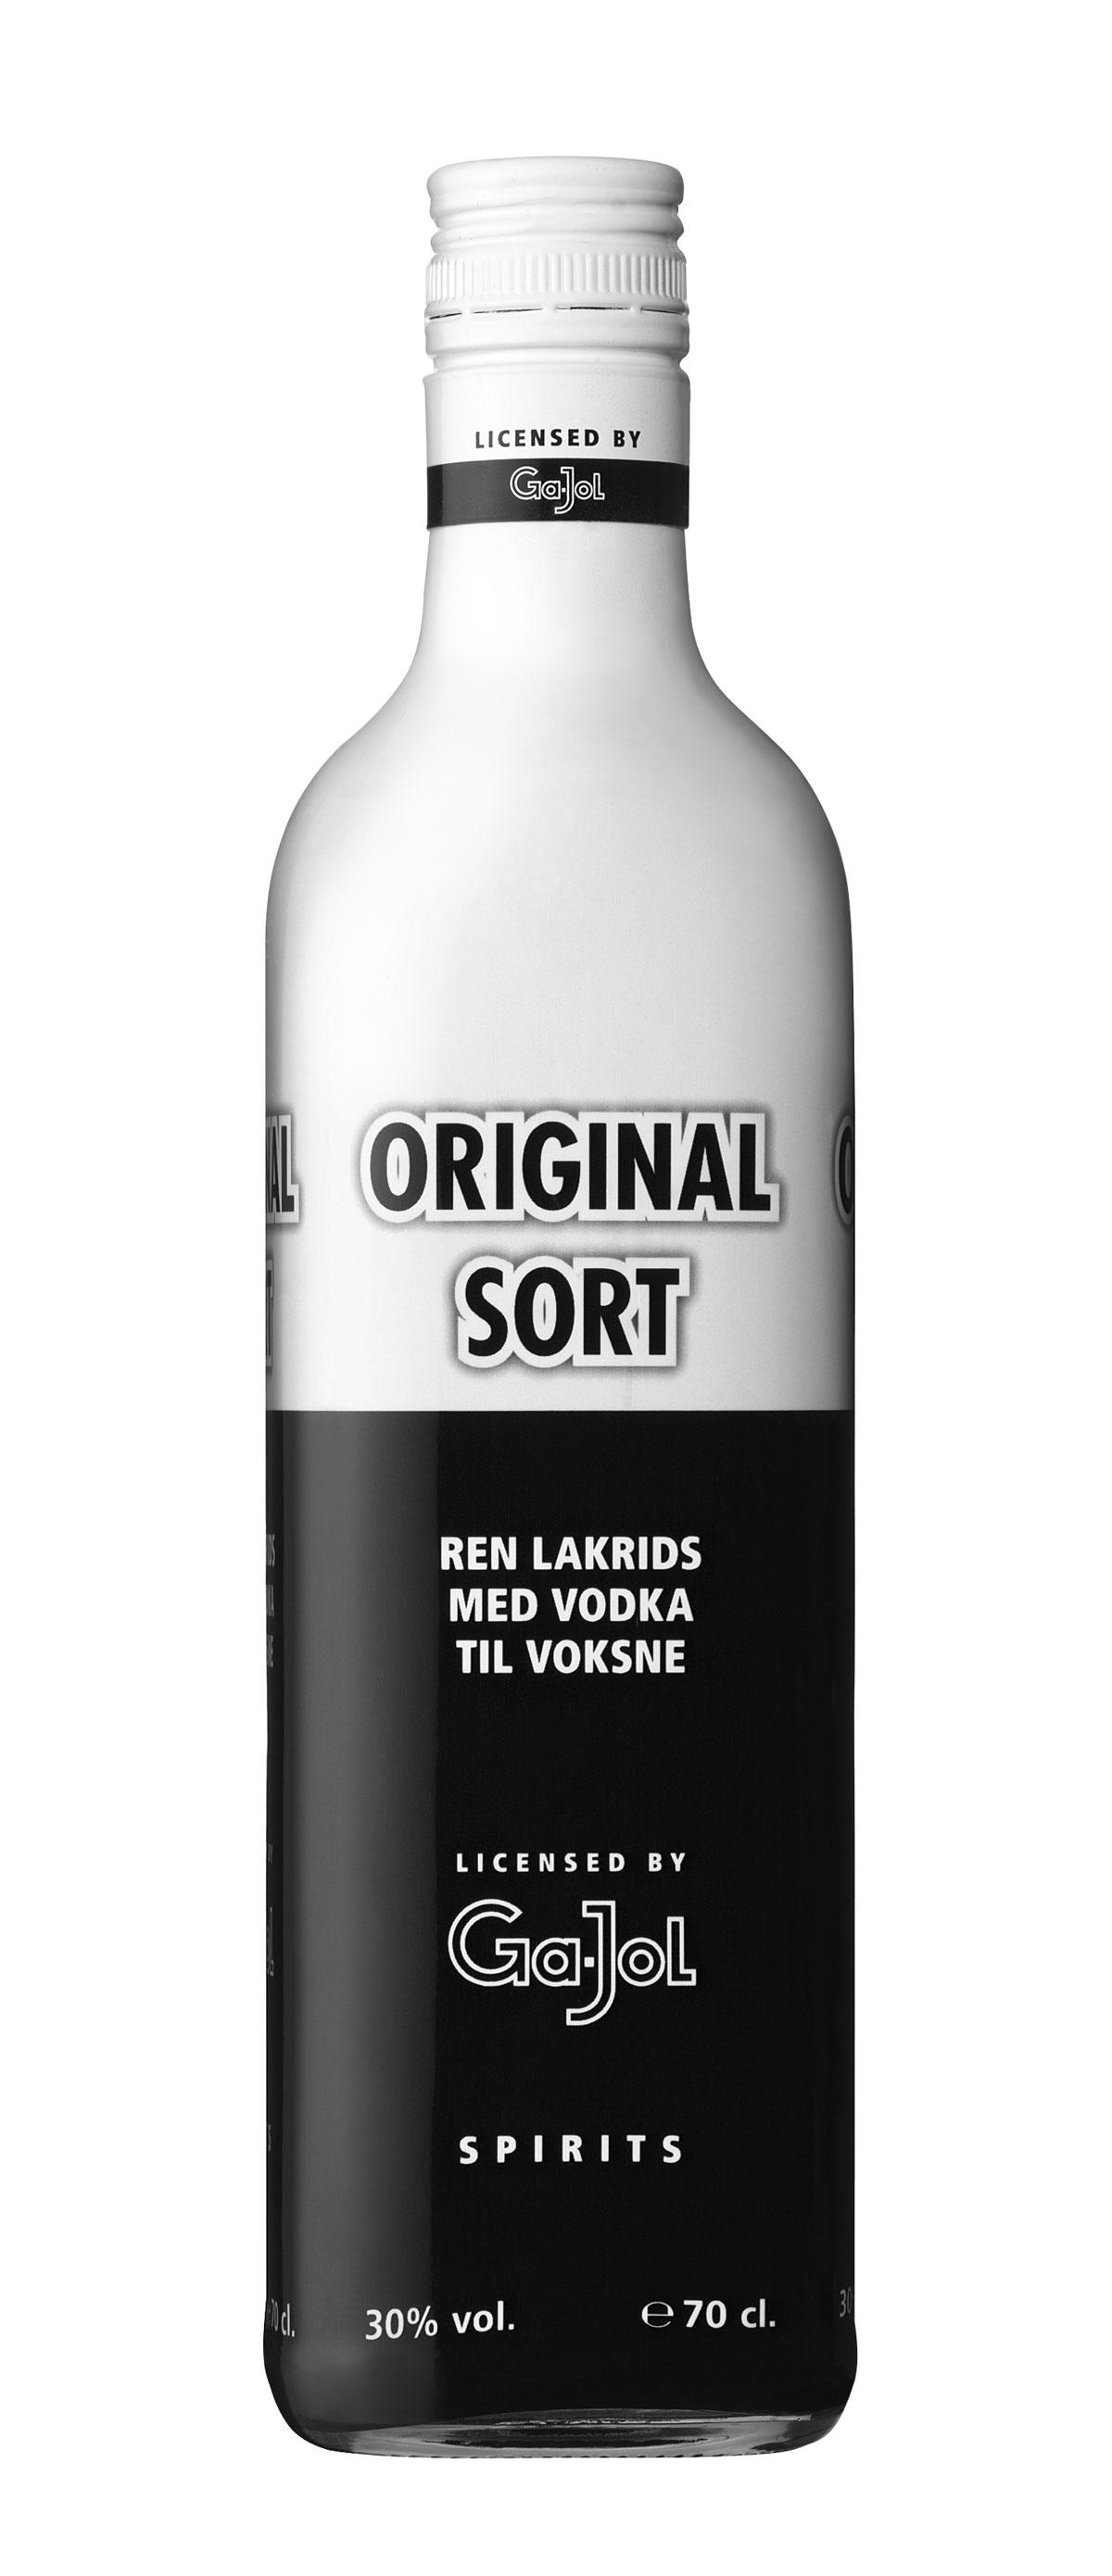 Tidssvarende Gajol | DrinksMeister - Drinks & Cocktails, Drinksopskrifter, Rom AX-46